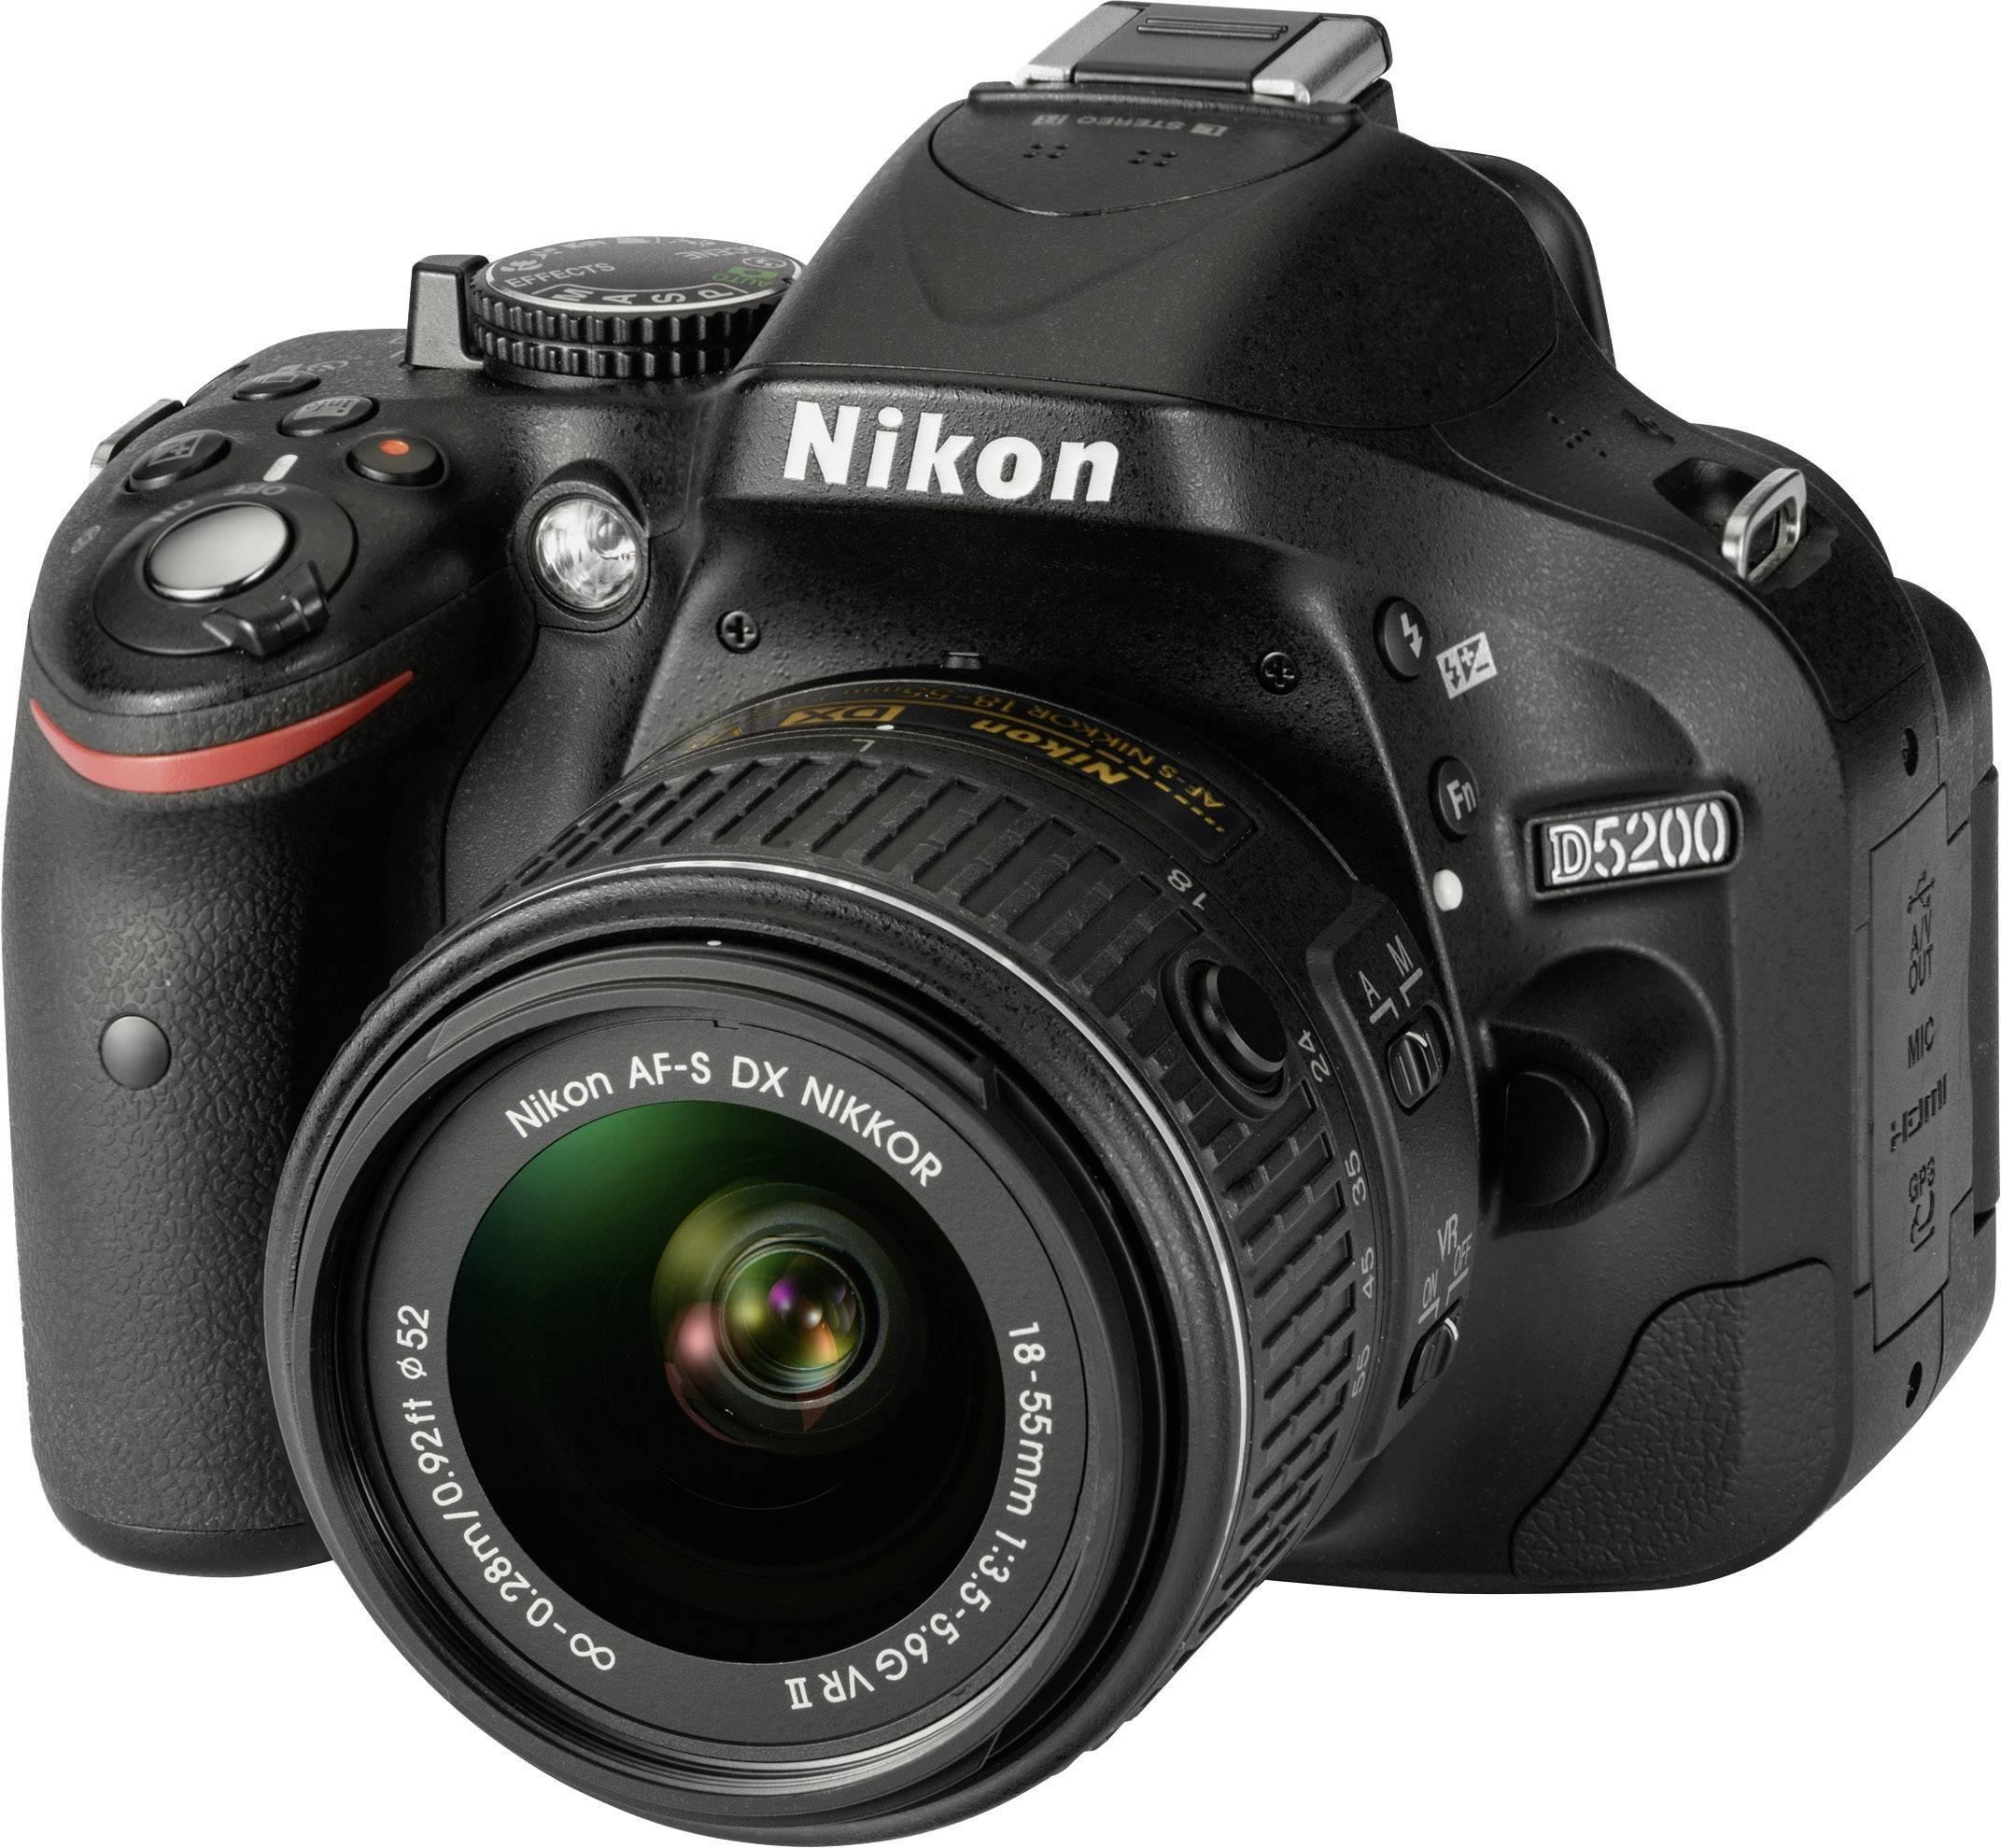 Nikon D5200 18 55 Vr Ii Dslr Camera Af S Dx Nikkor 18 55 Mm Vr Ii Black Full Hd Video Pivoted Display Optical Viewf Conrad Com